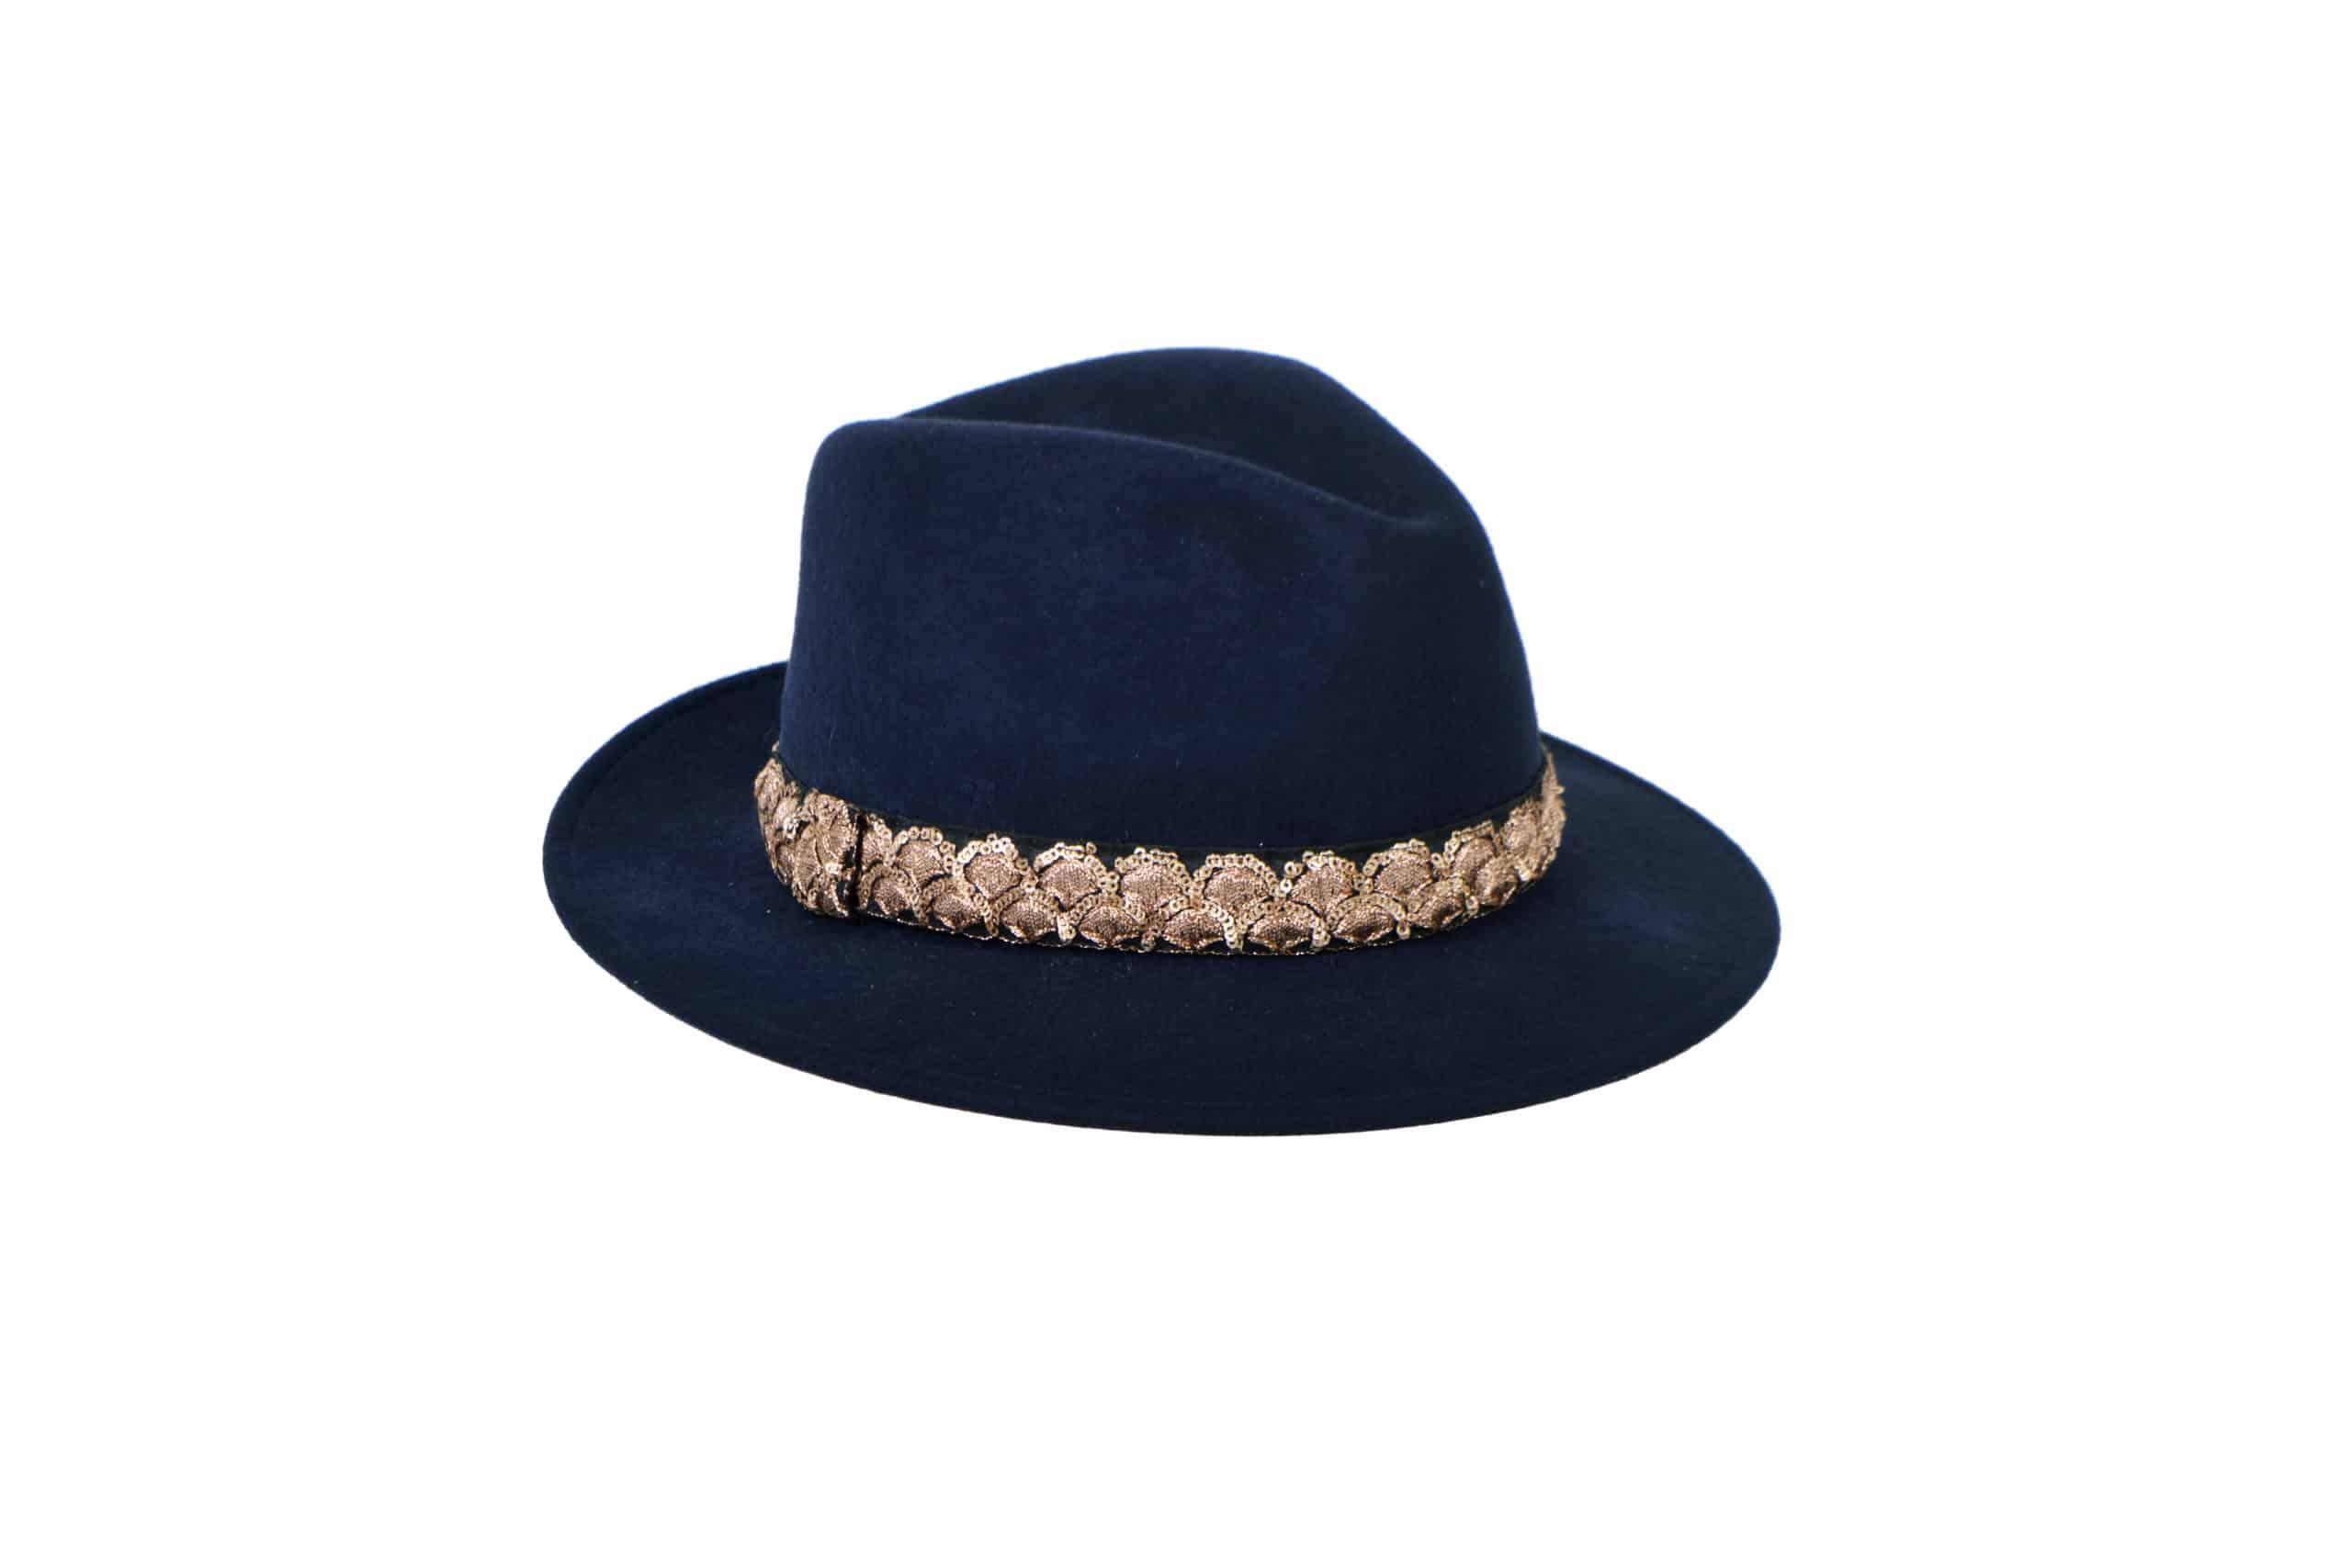 Sombrero borsalino Sasha Noche por MARADJI